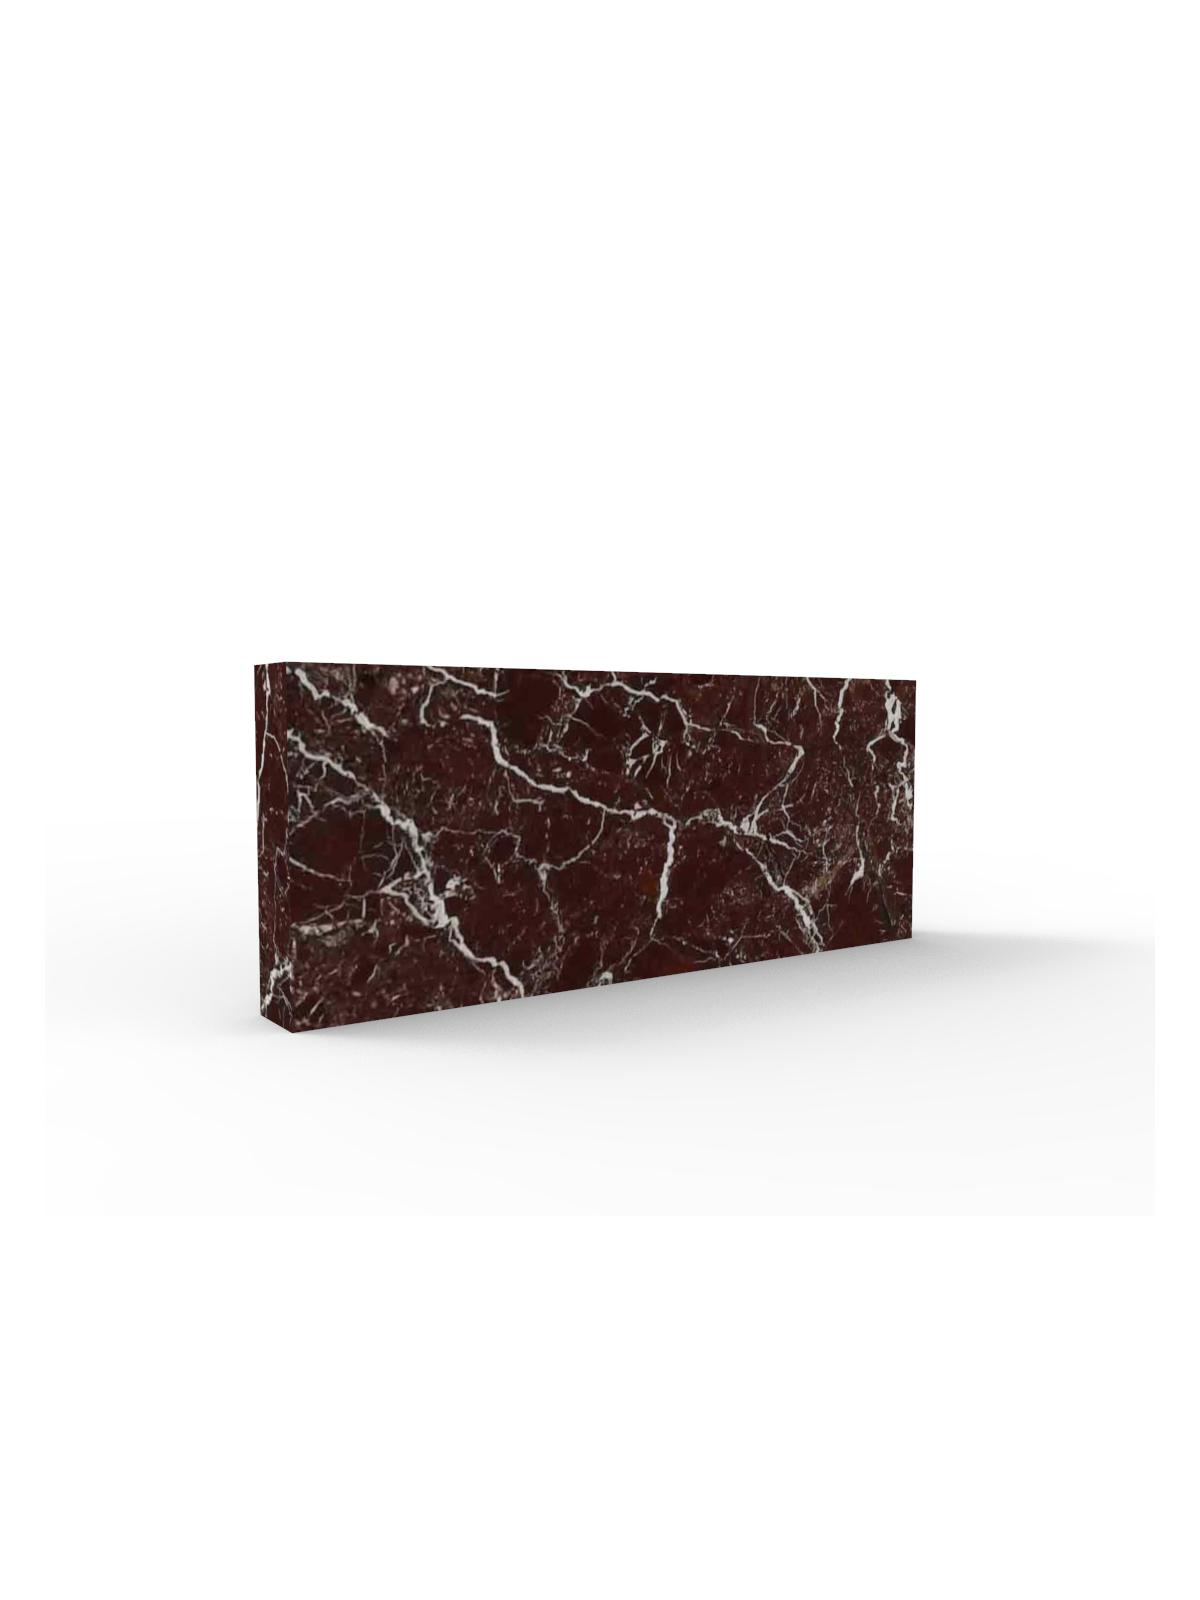 Sockelleisten in Rosso Levanto Marmor